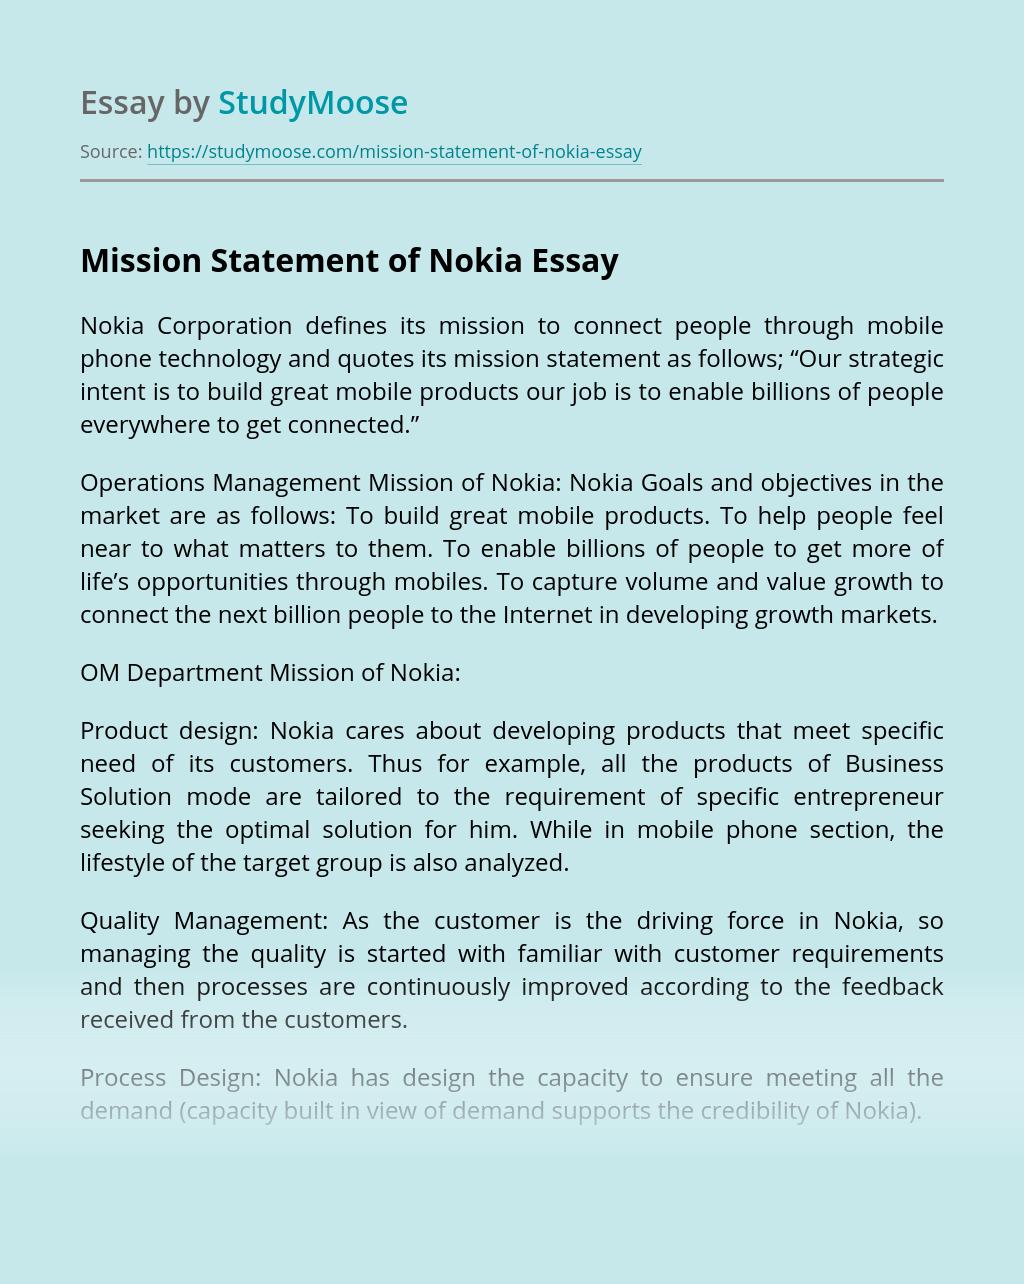 Mission Statement of Nokia